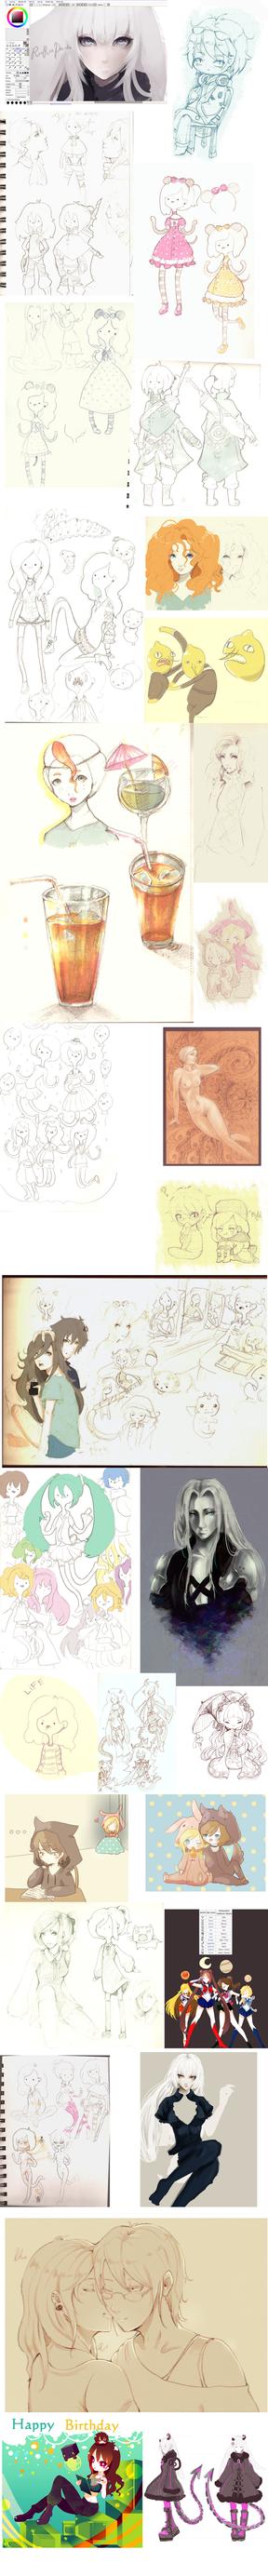 Sketch Dump-Summer edition by RinRinDaishi